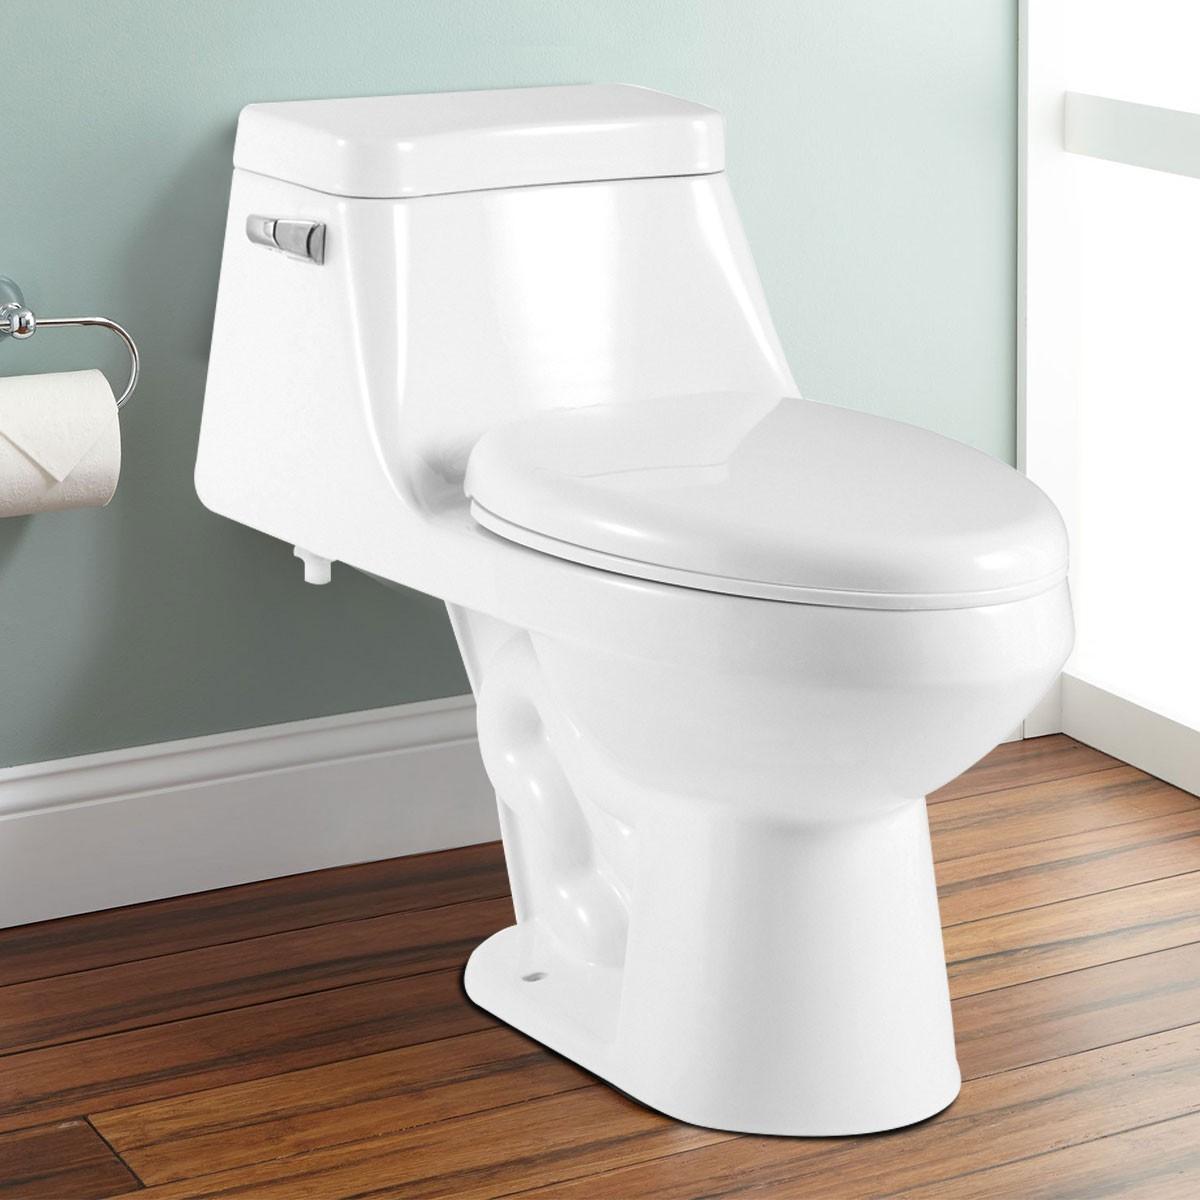 Single Flush Siphonic One-piece Toilet (DK-ZBQ-12228) | Decoraport USA